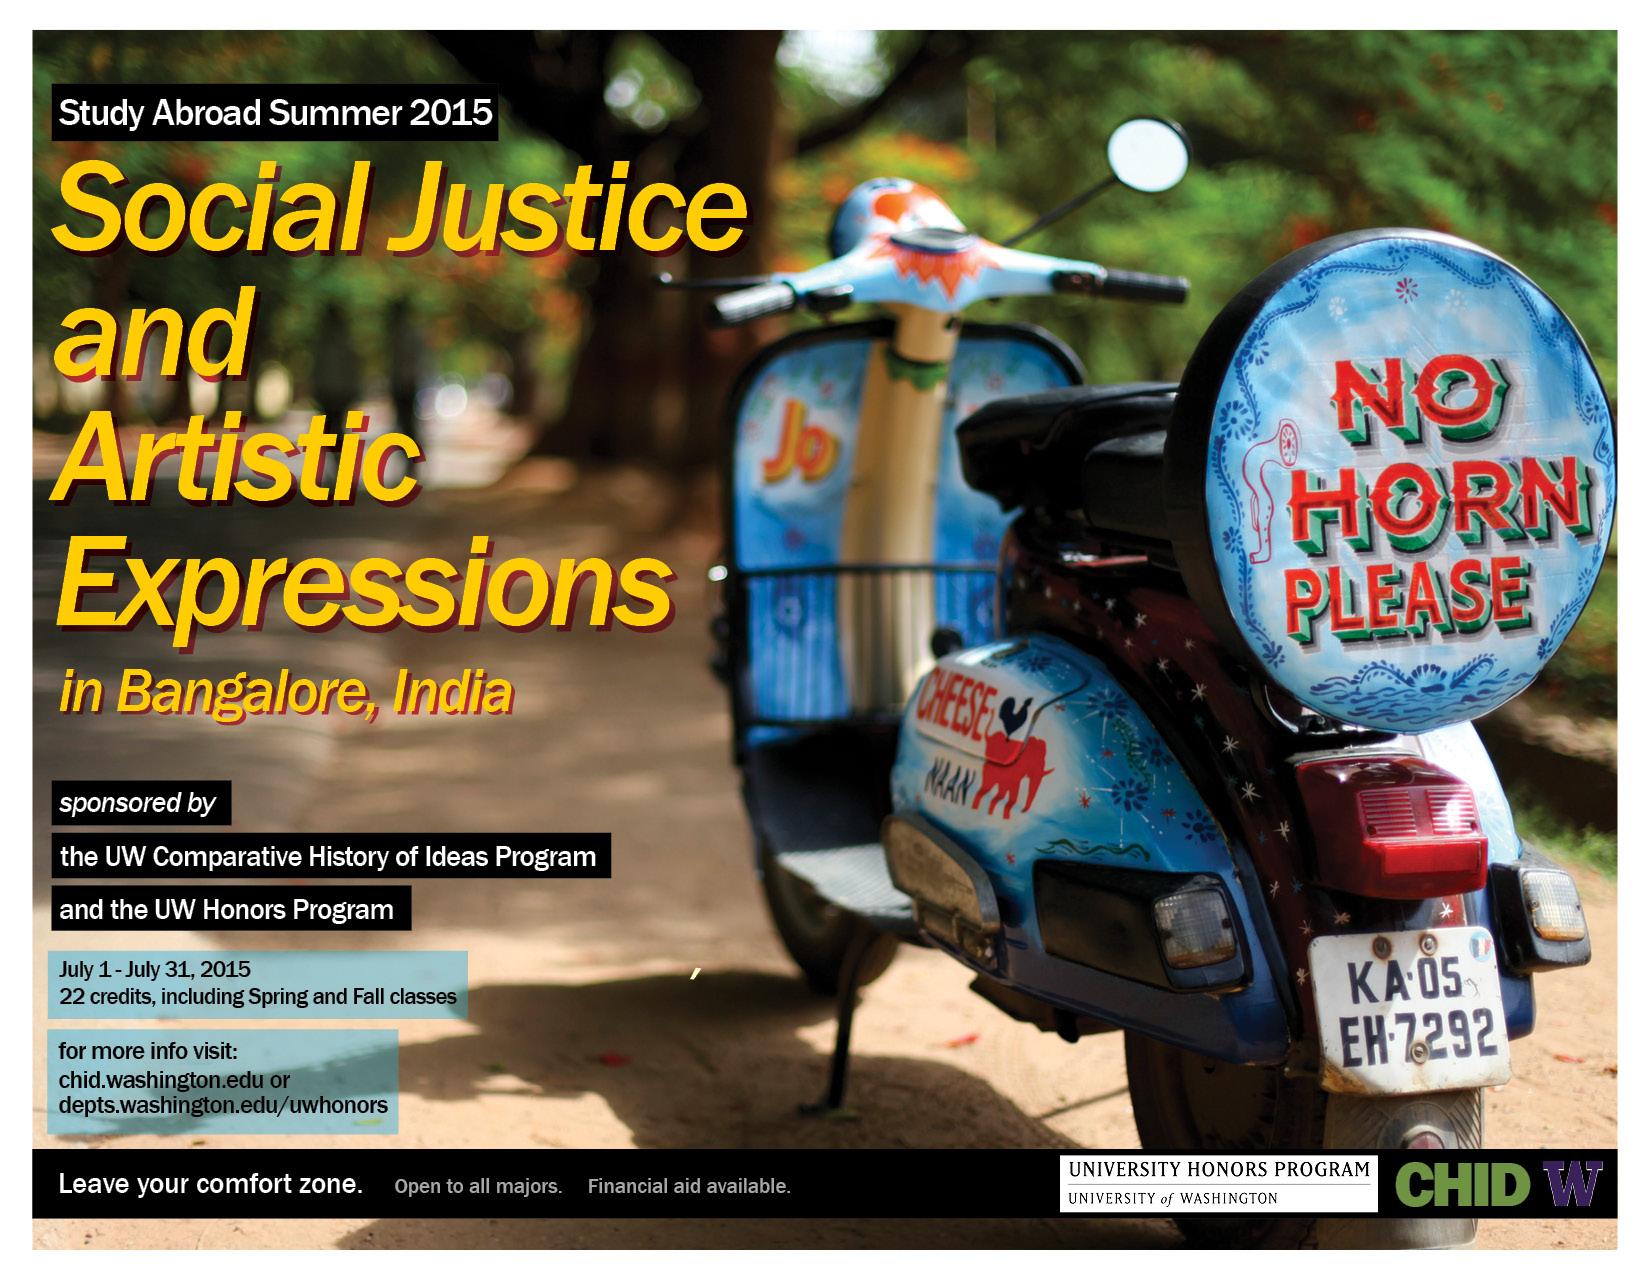 CHID - Honors - Bangalore study abroad 2015